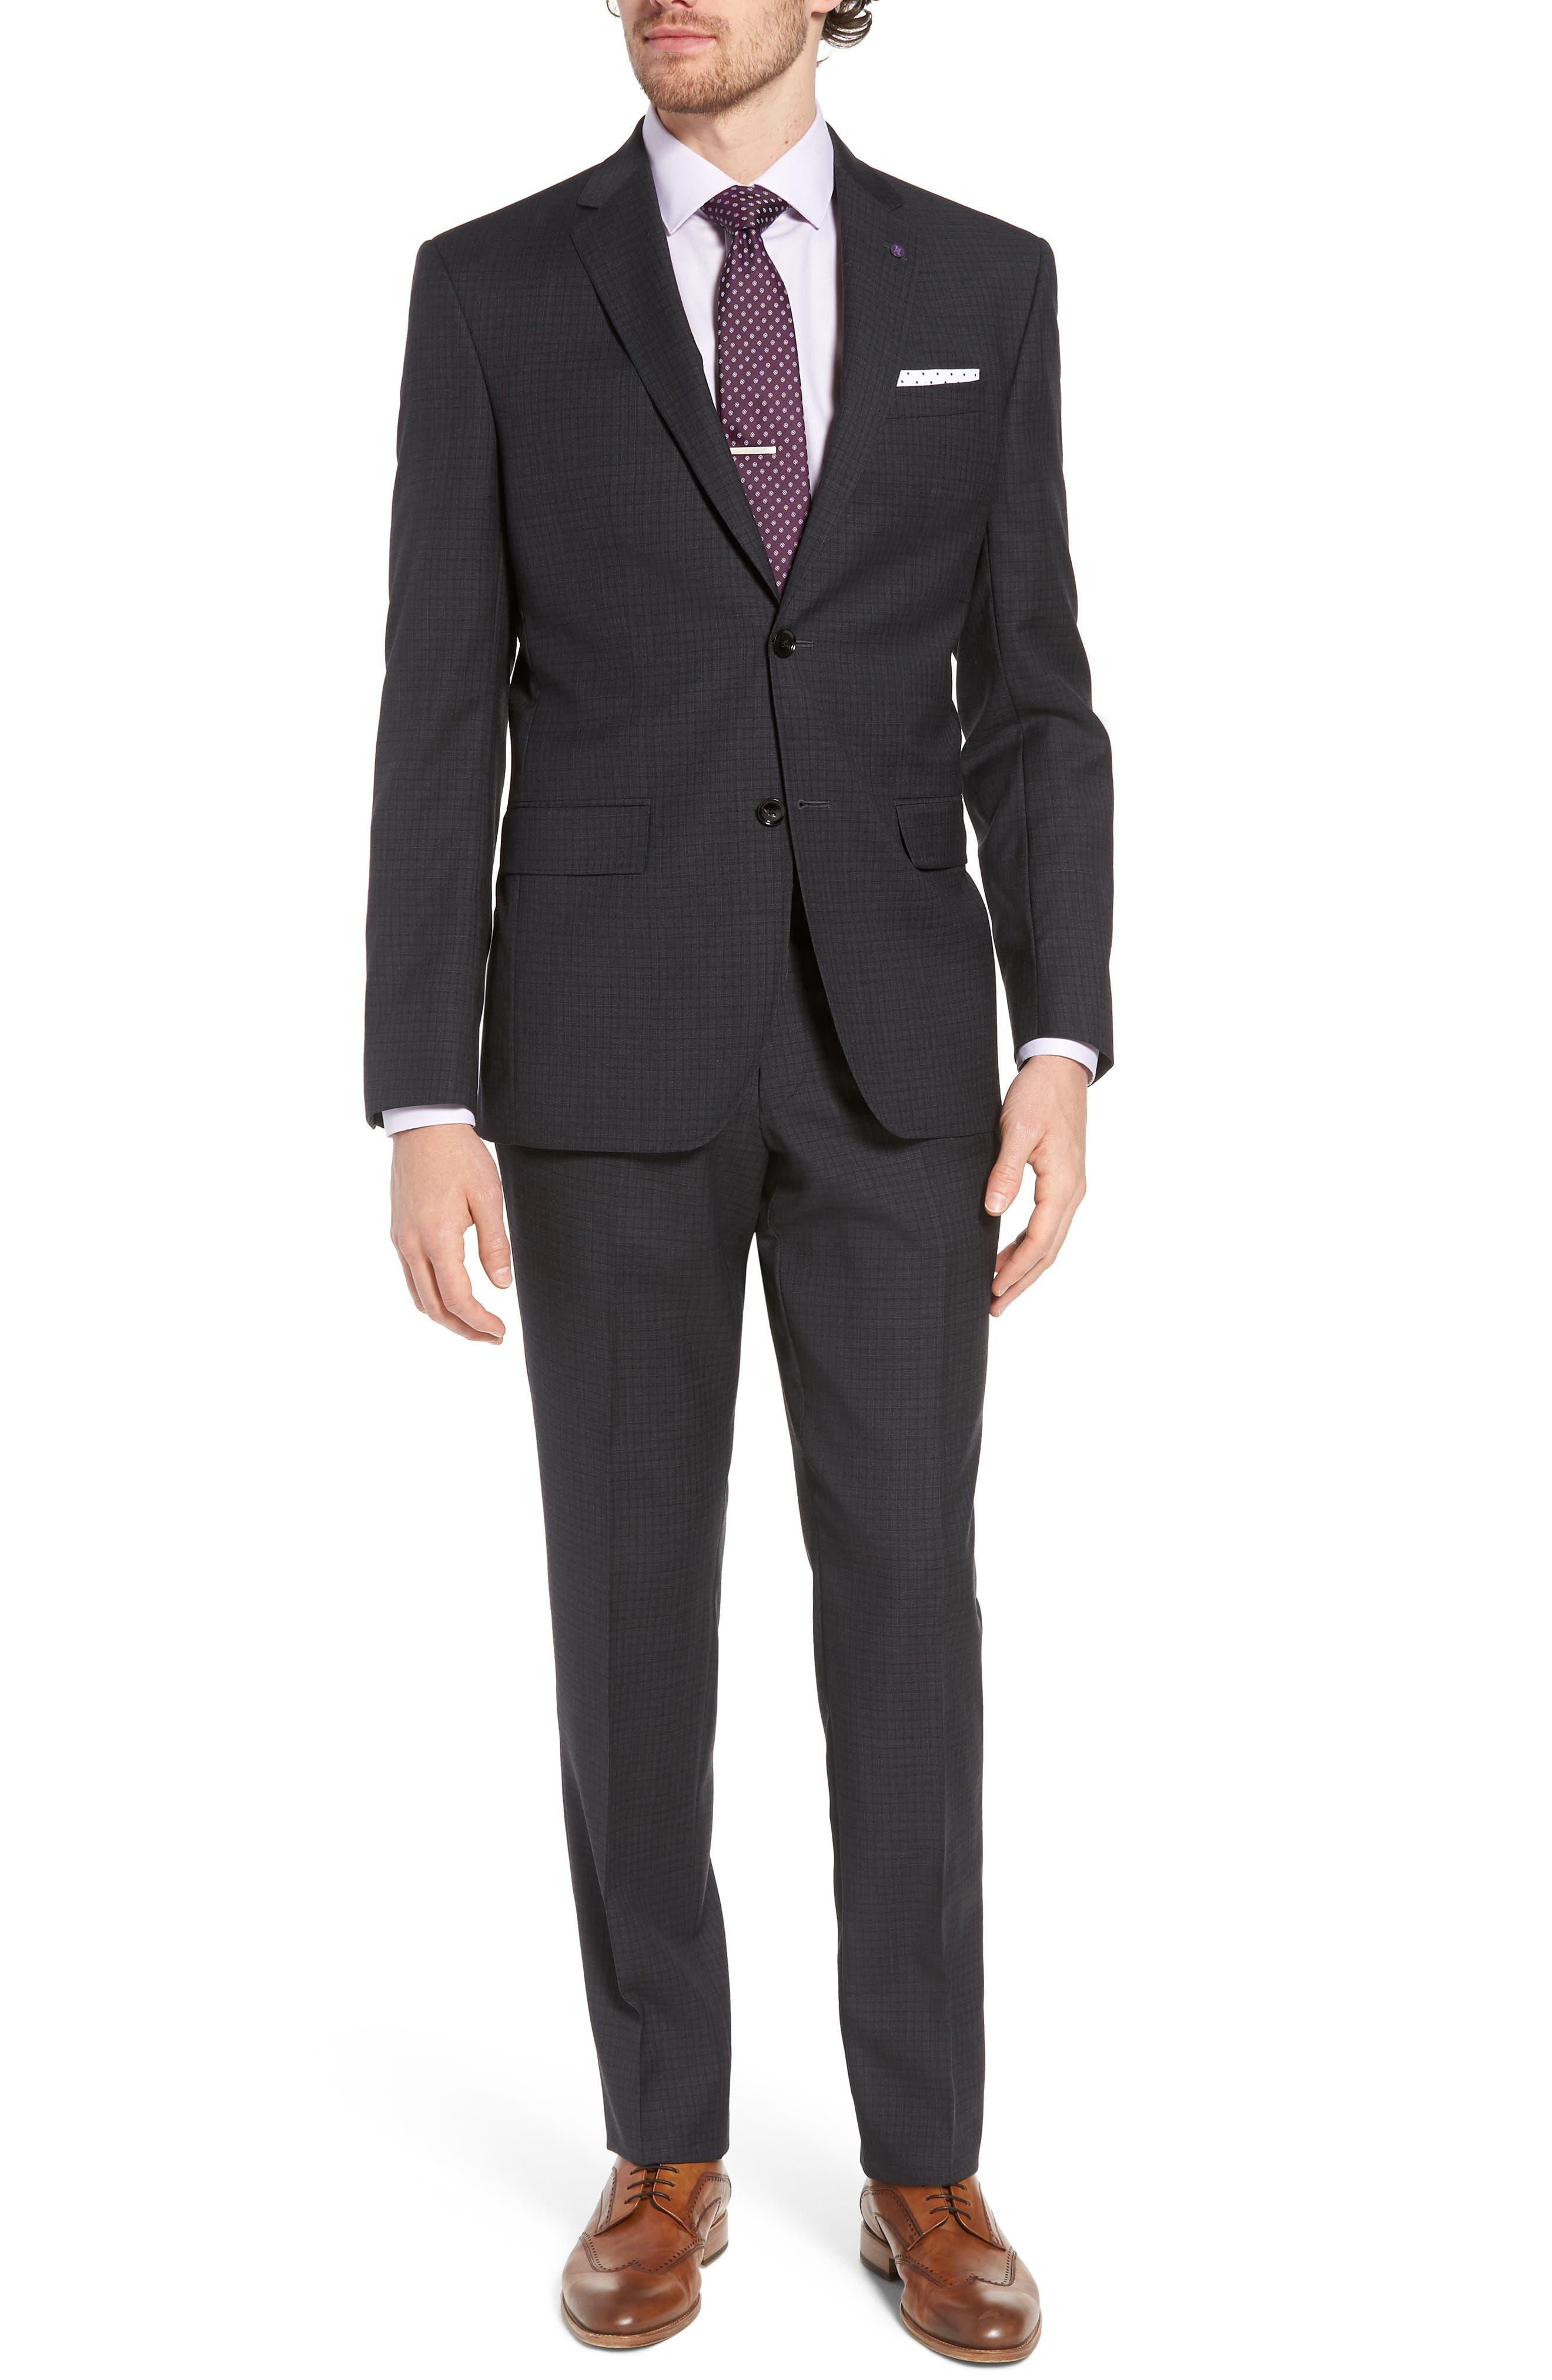 Jay Trim Fit Check Wool Suit,                         Main,                         color, 020